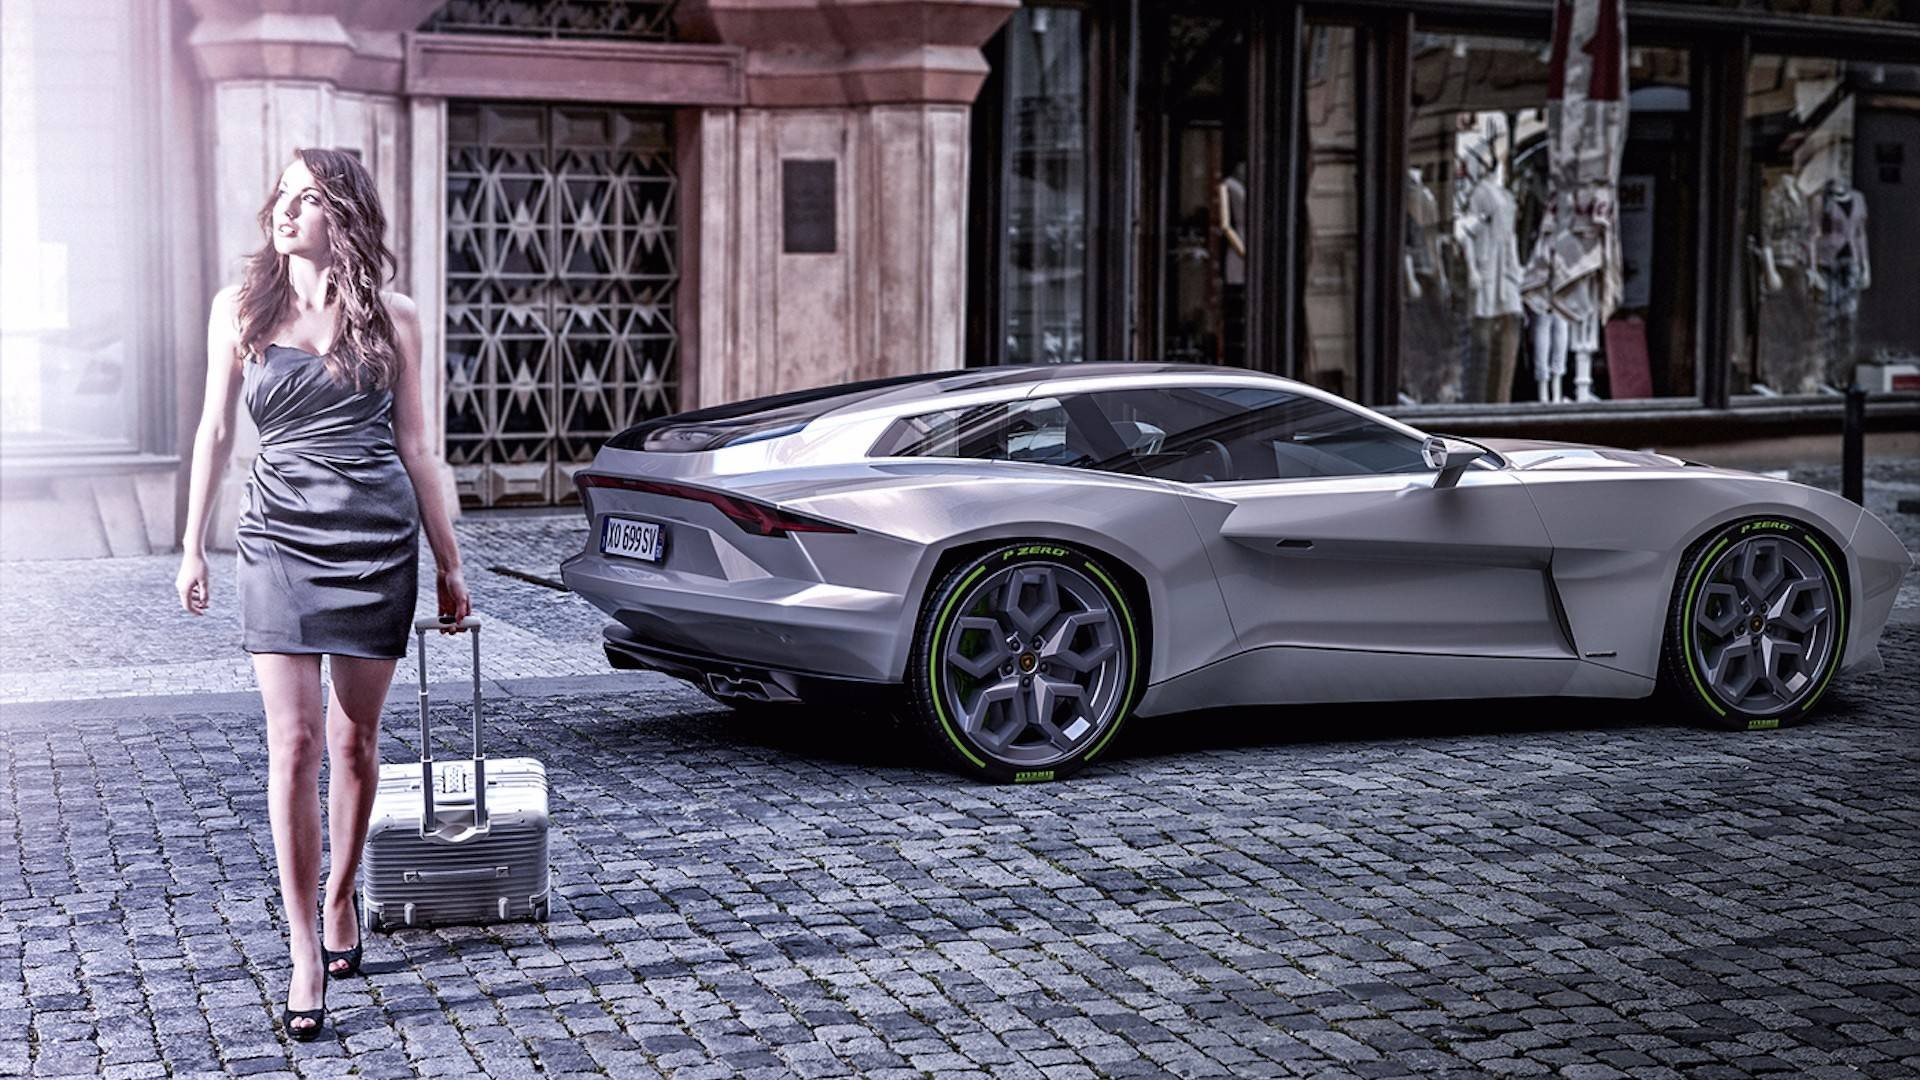 Русский художник представил рендер суперкара Lamborghini вкузове Shooting Brake